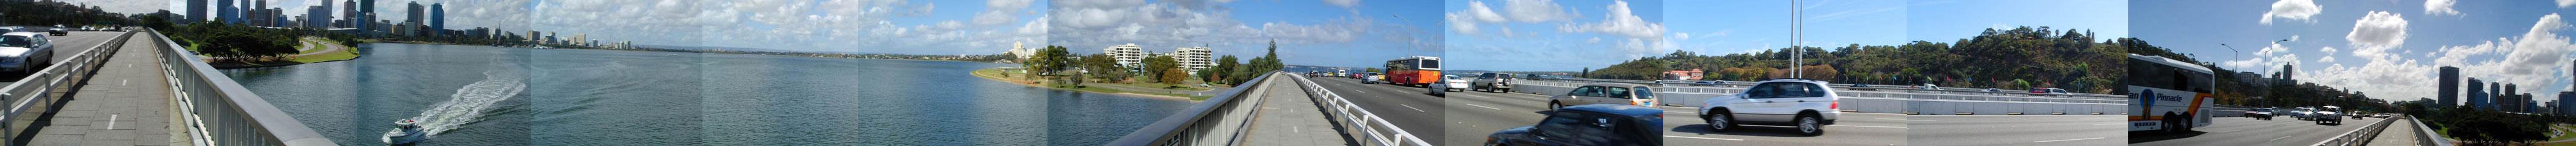 Narrows Bridge Panorama